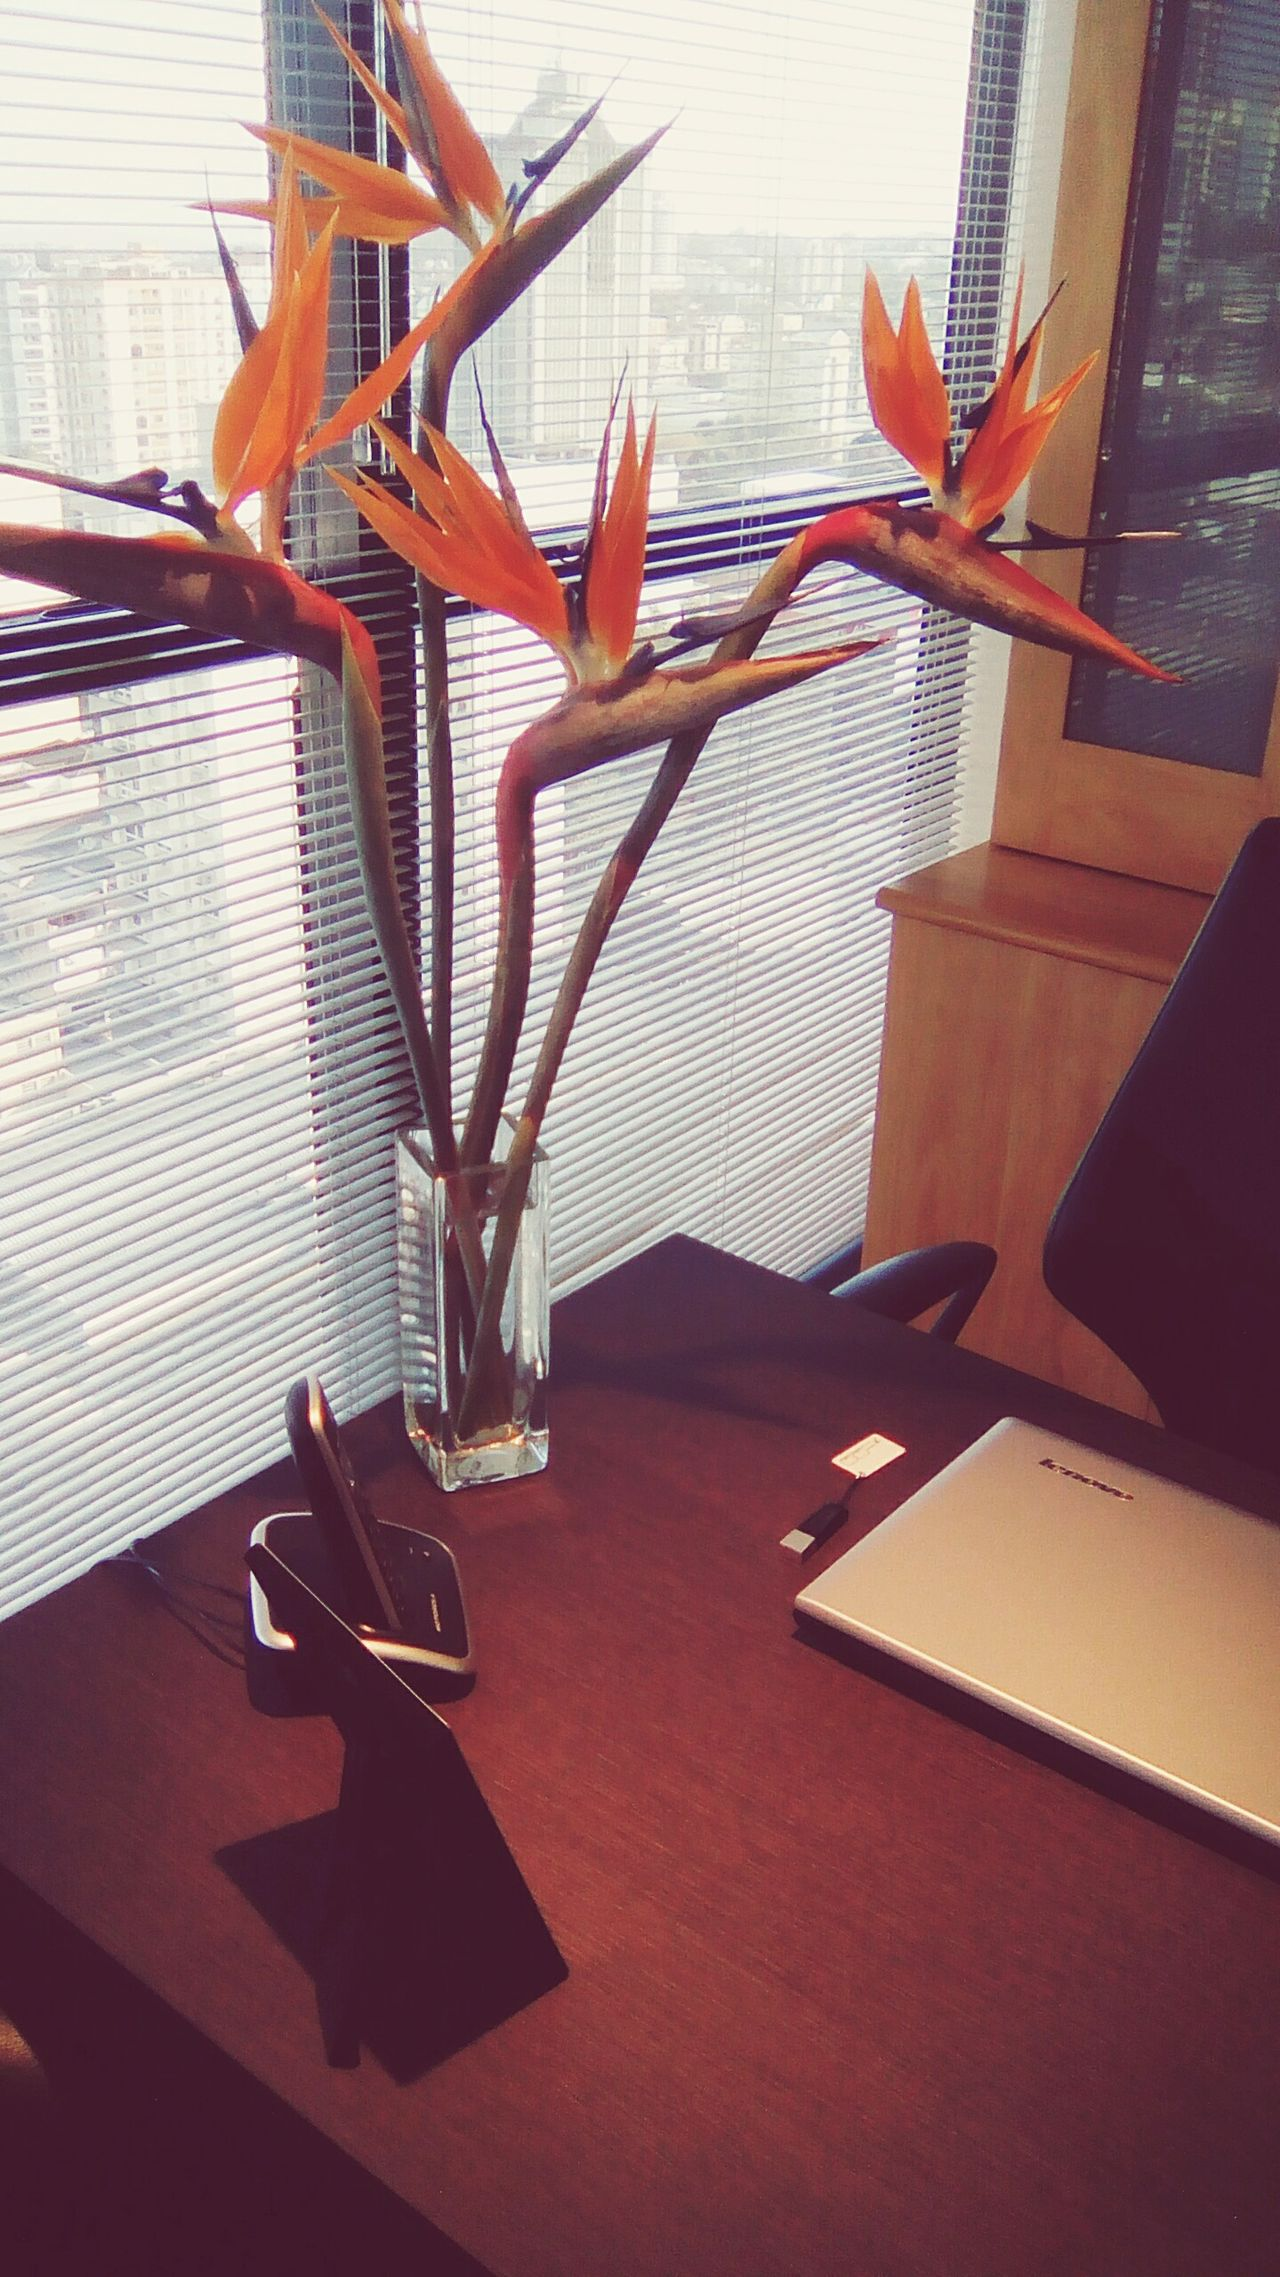 Flower Home Interior Window Escritório Escrivaninha Day No People Interior Designer  Working Day Glass - Material Sala Acerphotography Acer Accersories Accessory Janelas Persianas Vidro Notebook Laptop. Telefon Teléfono Telefone Trabalho Daysun